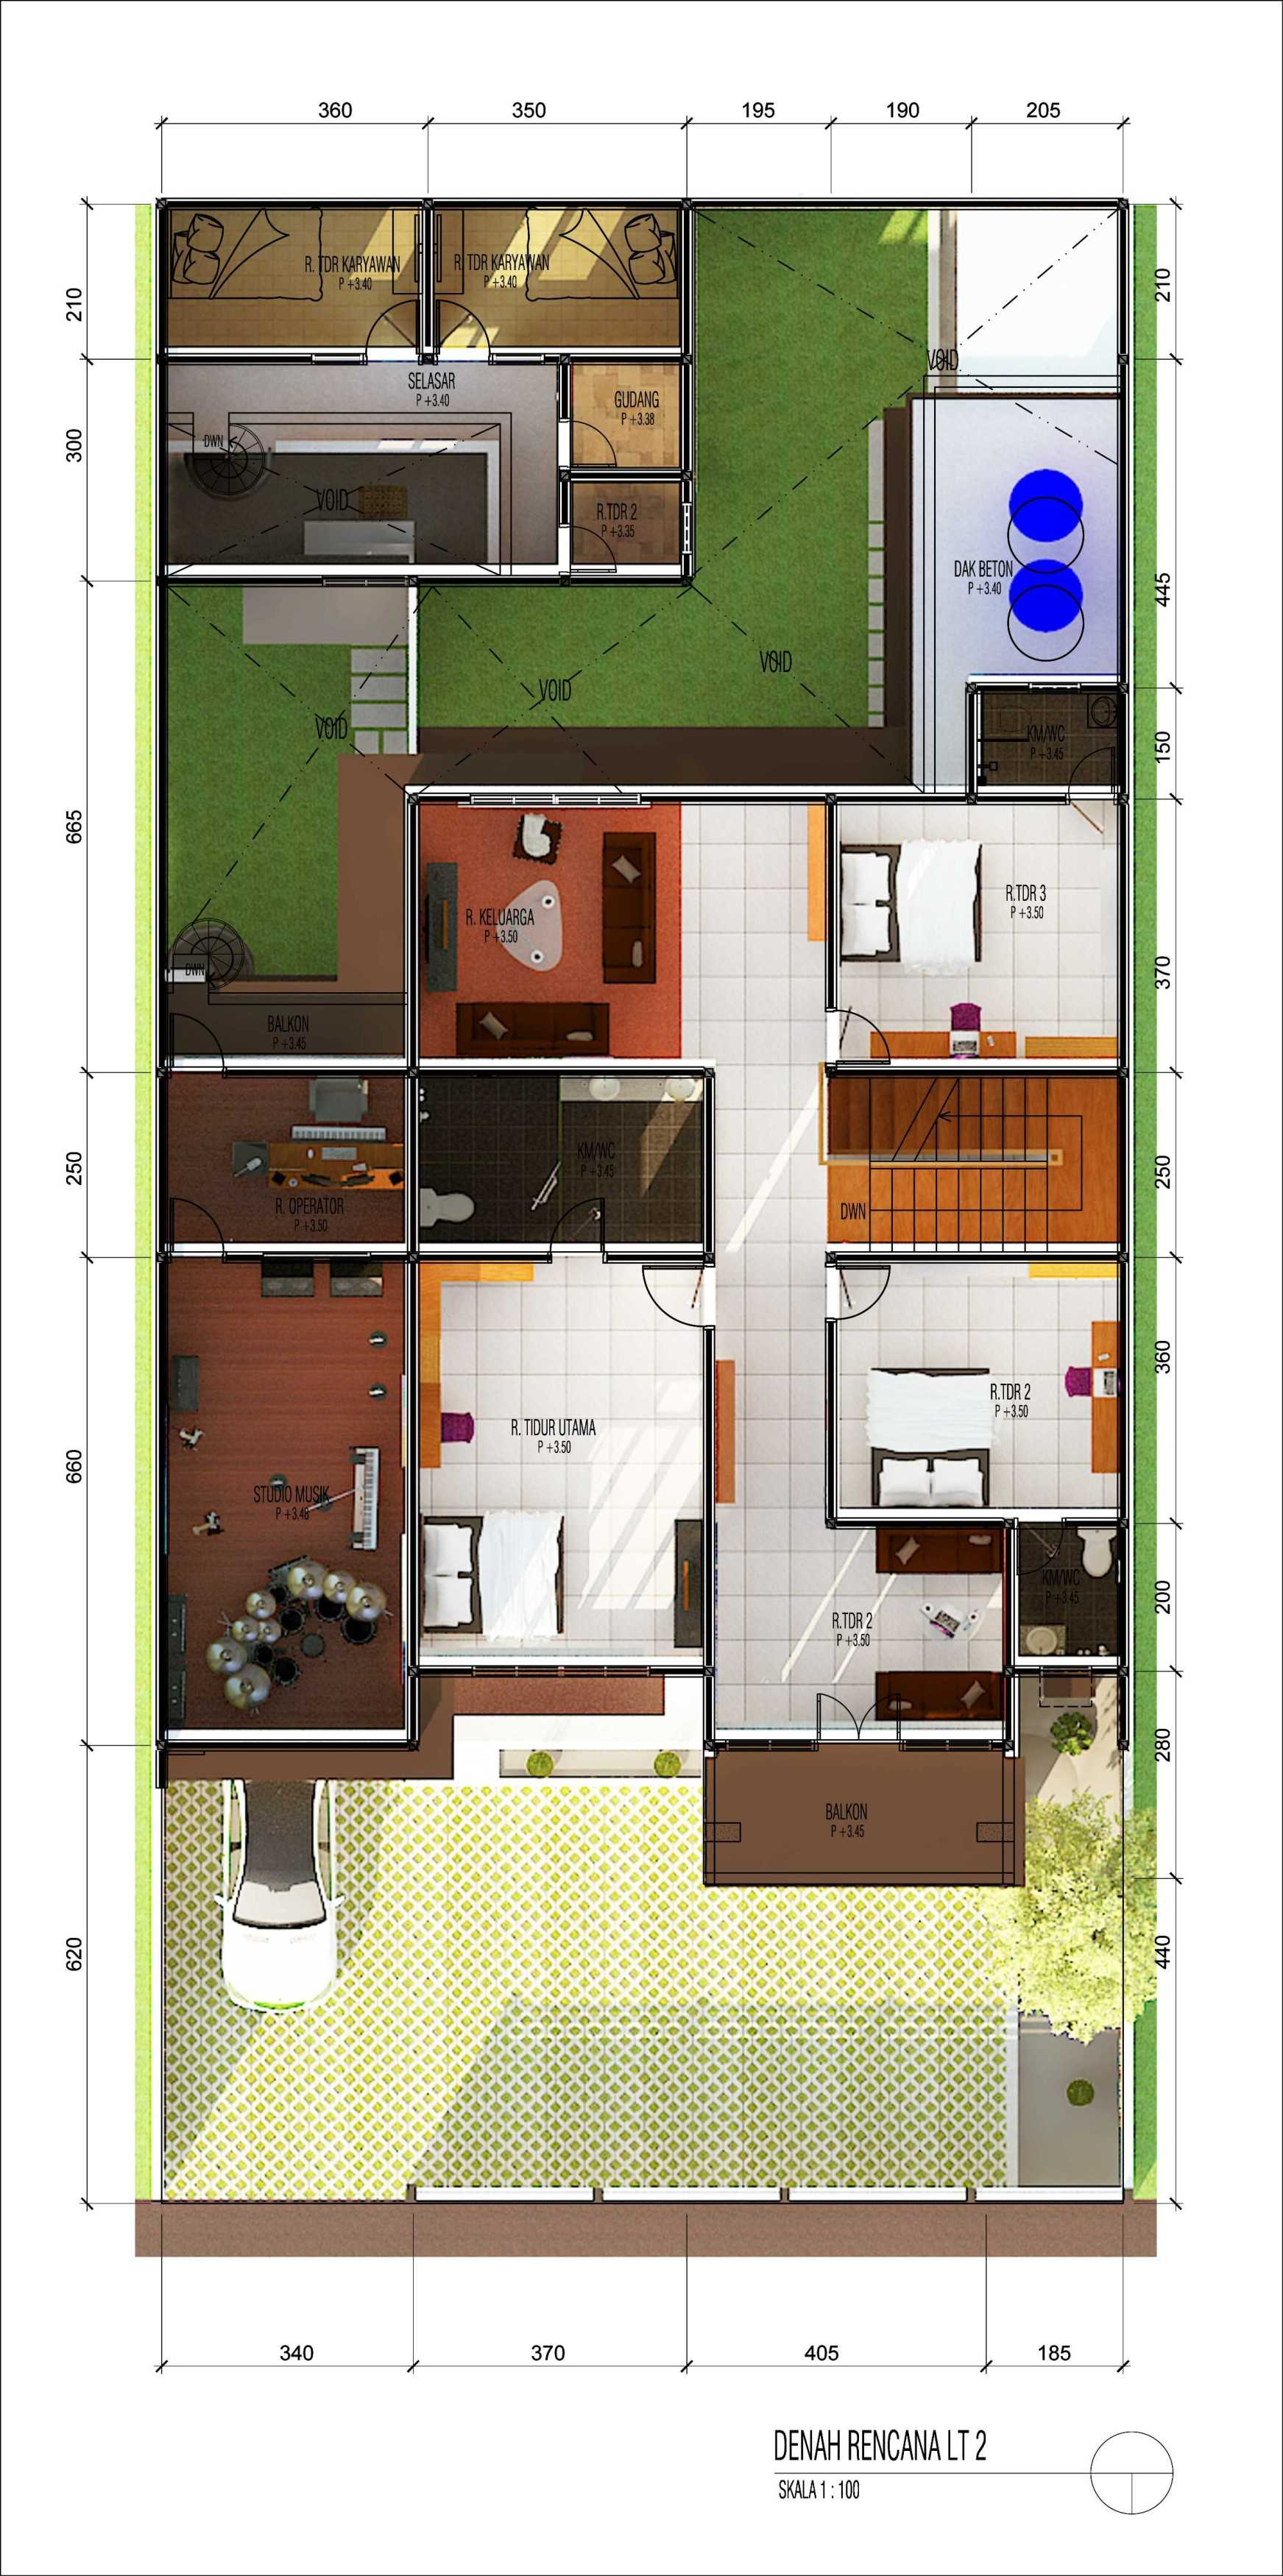 Archdesignbuild7 Rumah Tinggal 2 Lantai ( Minen )  Jl. Alfa Ii, Cigadung, Bandung Jl. Alfa Ii, Cigadung, Bandung Denah-Lt-Dua-Colour Tropis  20139